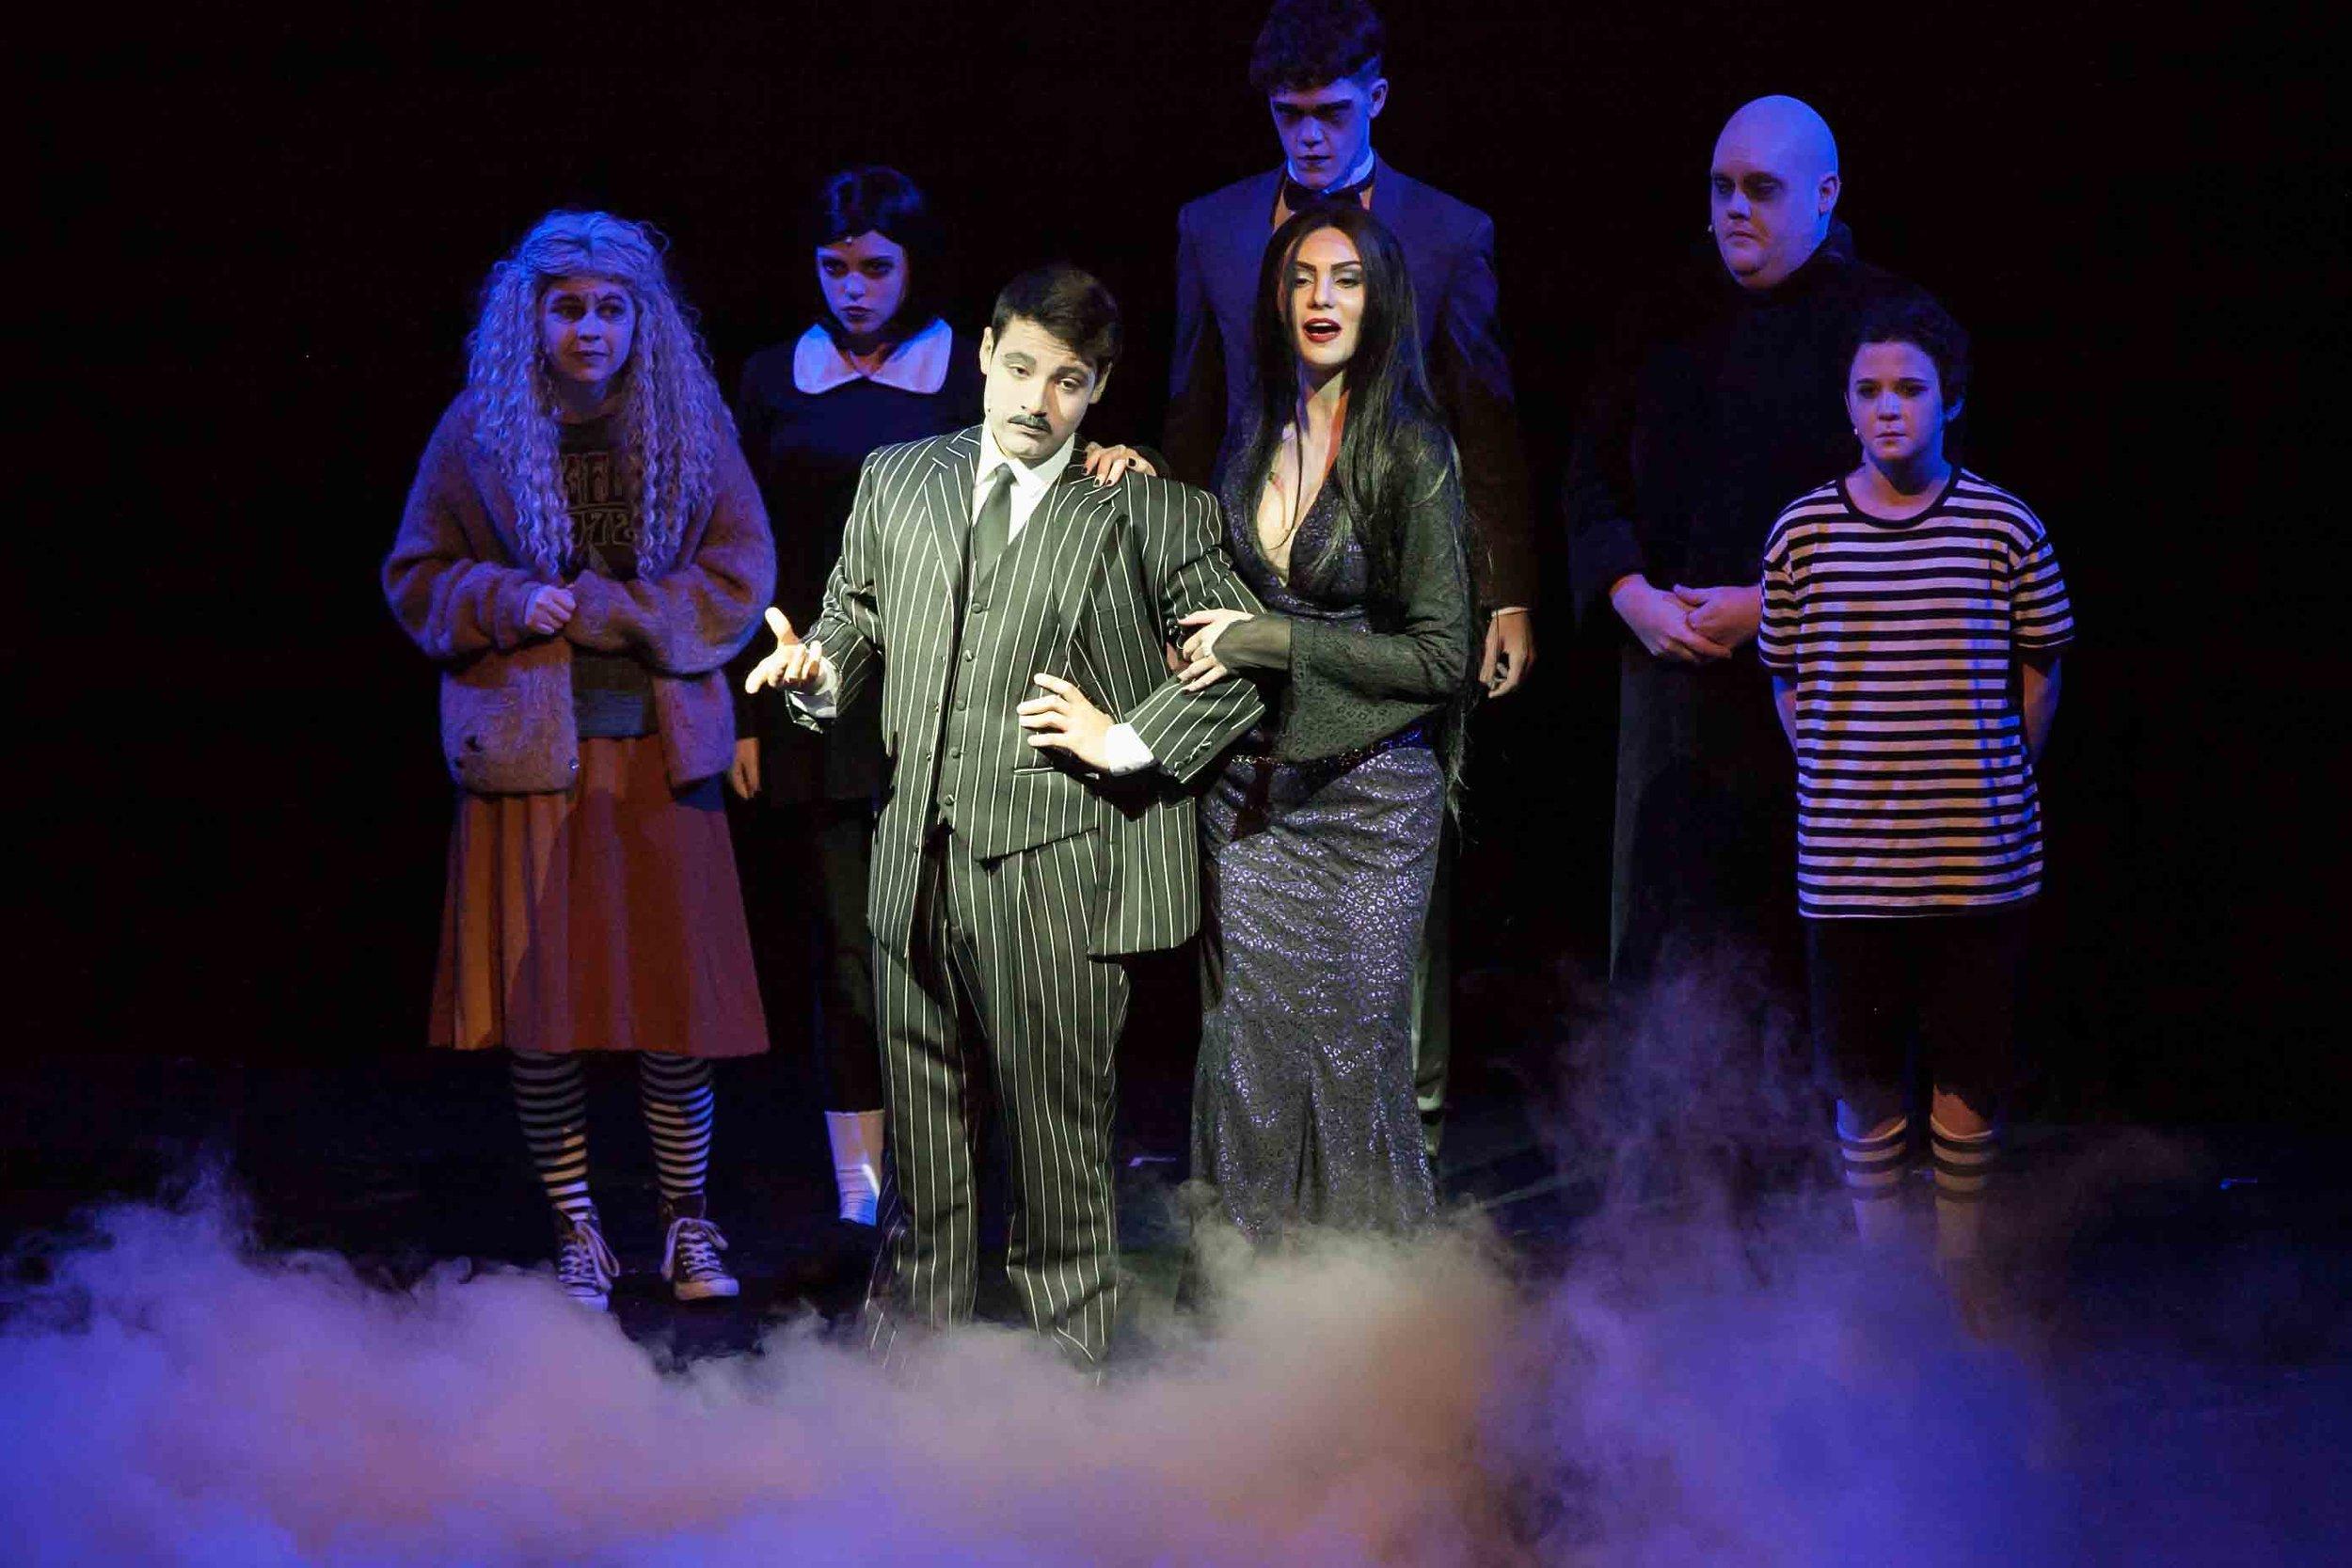 6-19-16 Addams Family Kooky Cast 0025.jpg